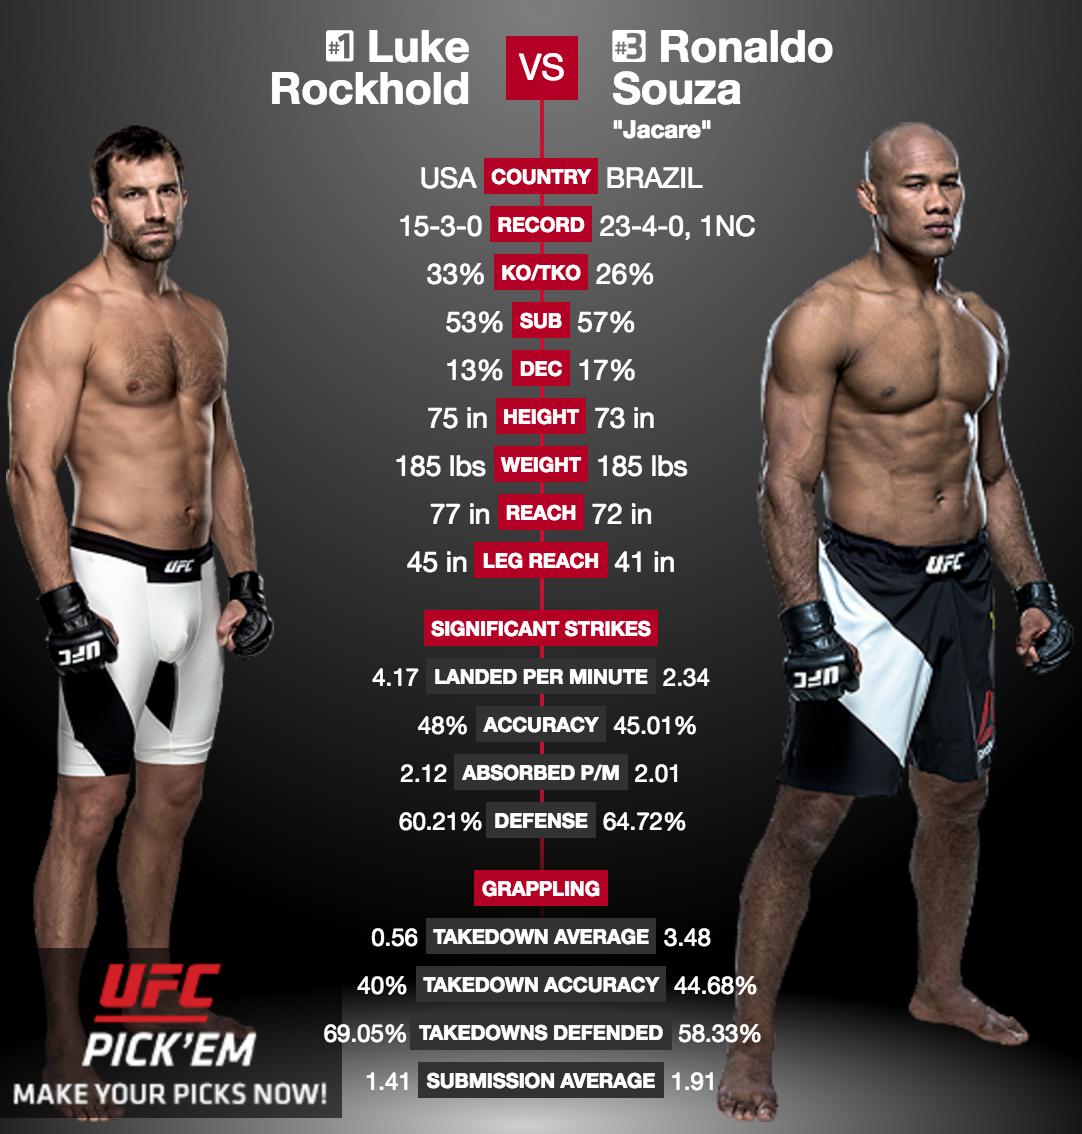 ufc-fight-night-101-luke-rockhold-vs-jacare-souza